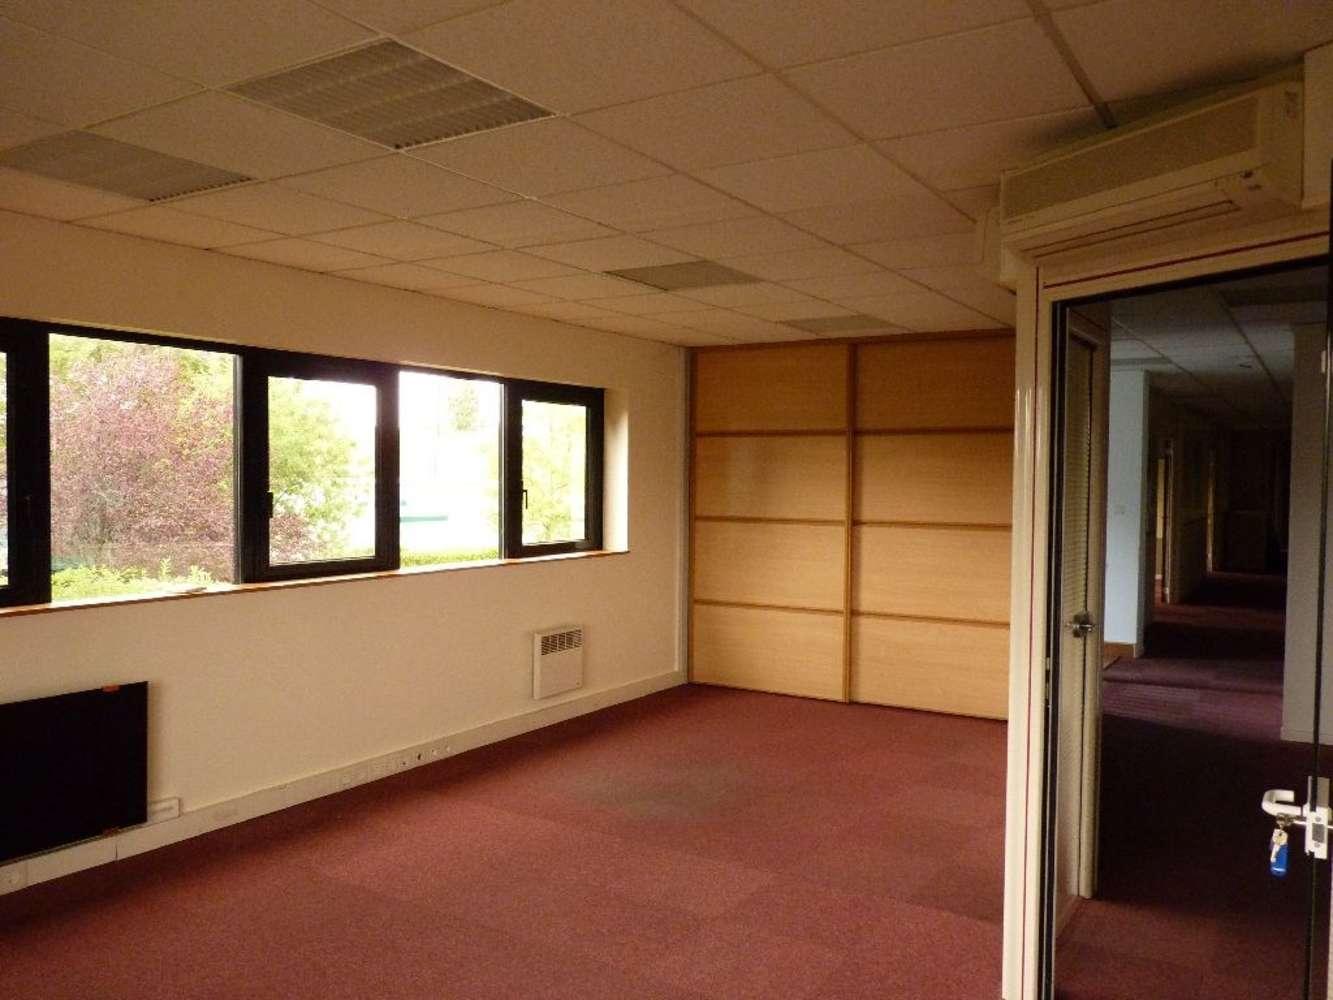 Activités/entrepôt Genas, 69740 - Location entrepot Genas - Lyon Est (69) - 9535939